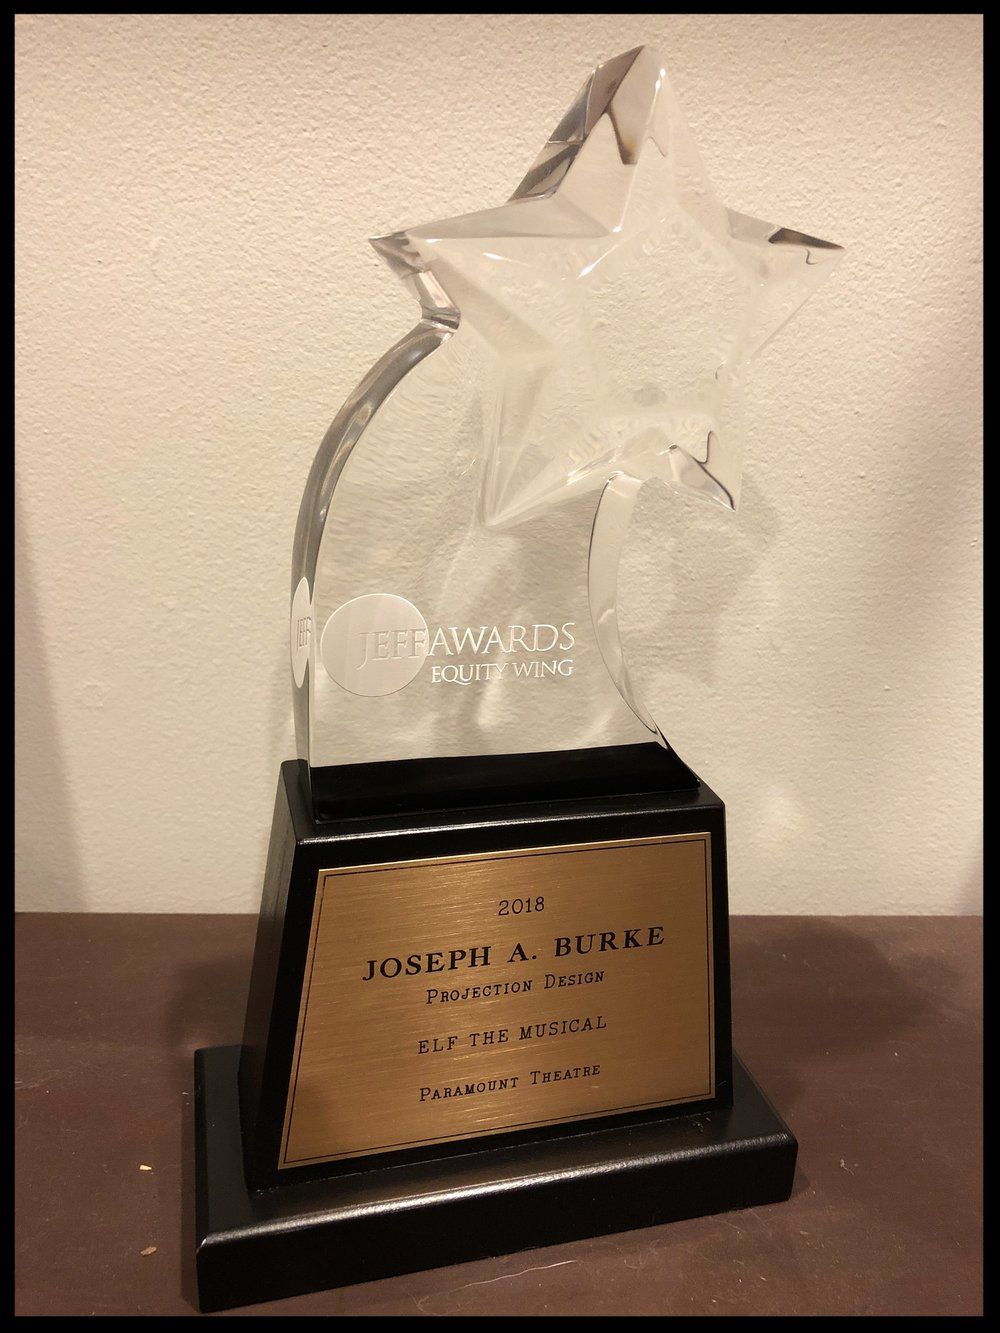 Jeff Awards_Projection Design_Joseph A Burke_Joe Burke.JPG